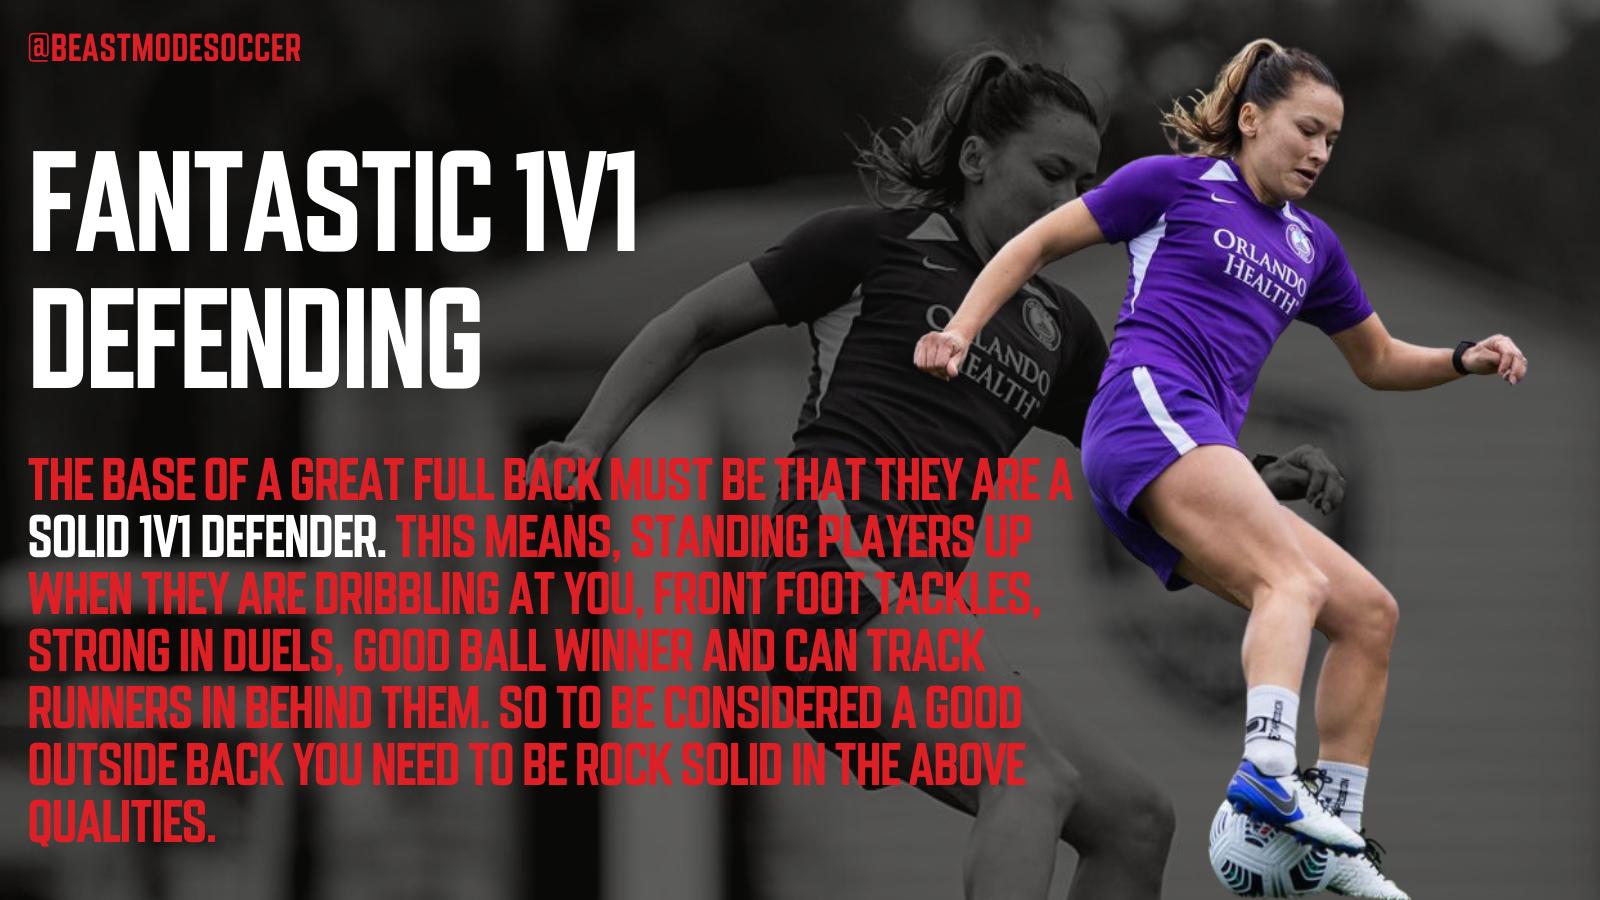 1v1 Defending in soccer